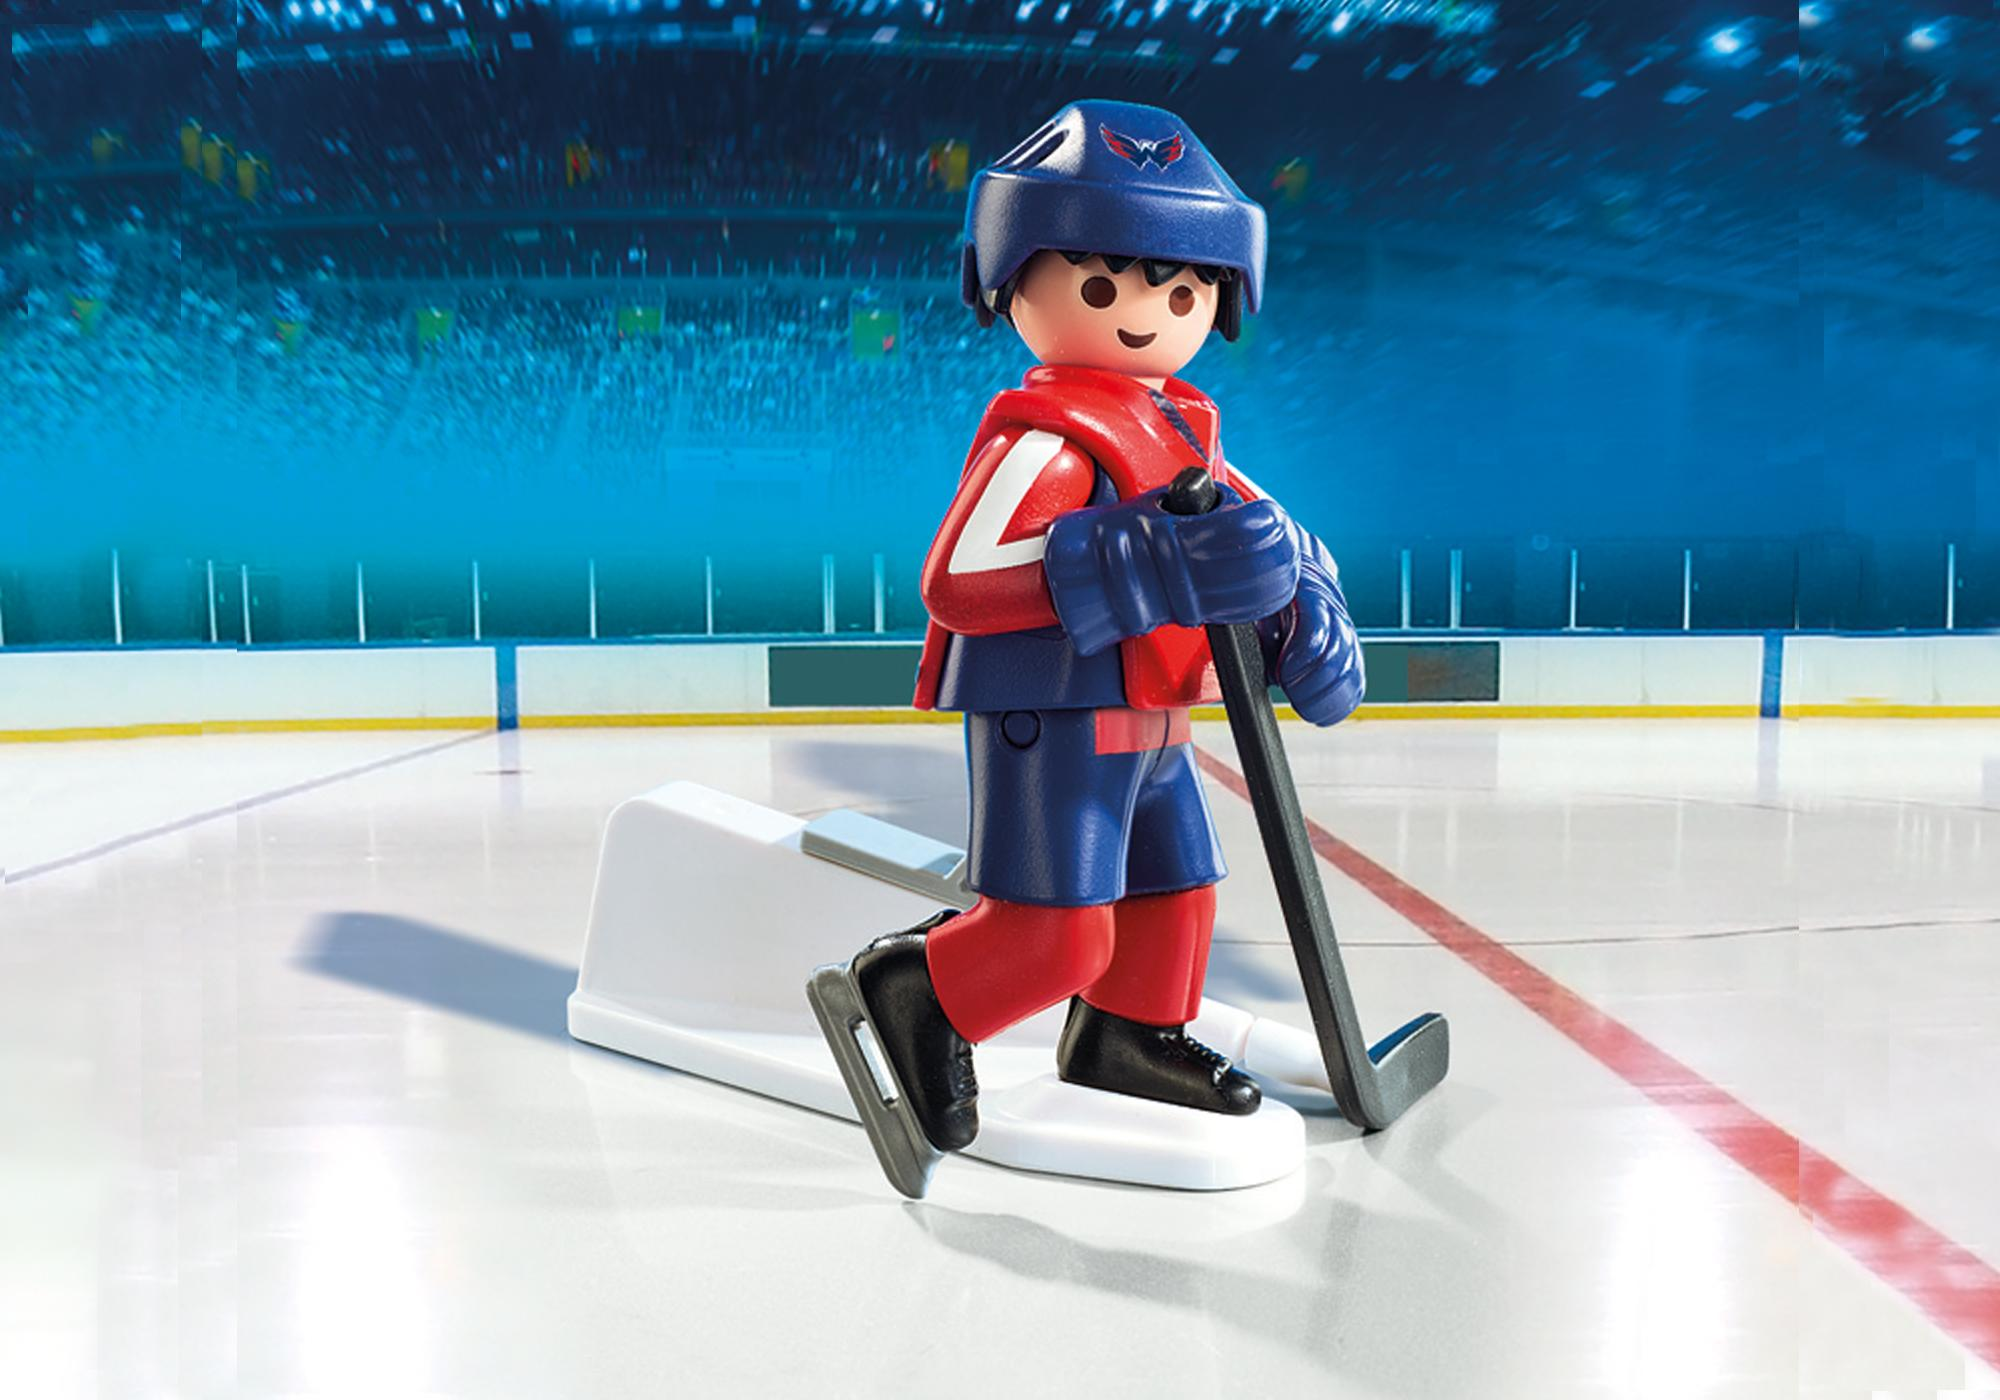 9035_product_detail/NHL™ Washington Capitals™ Player